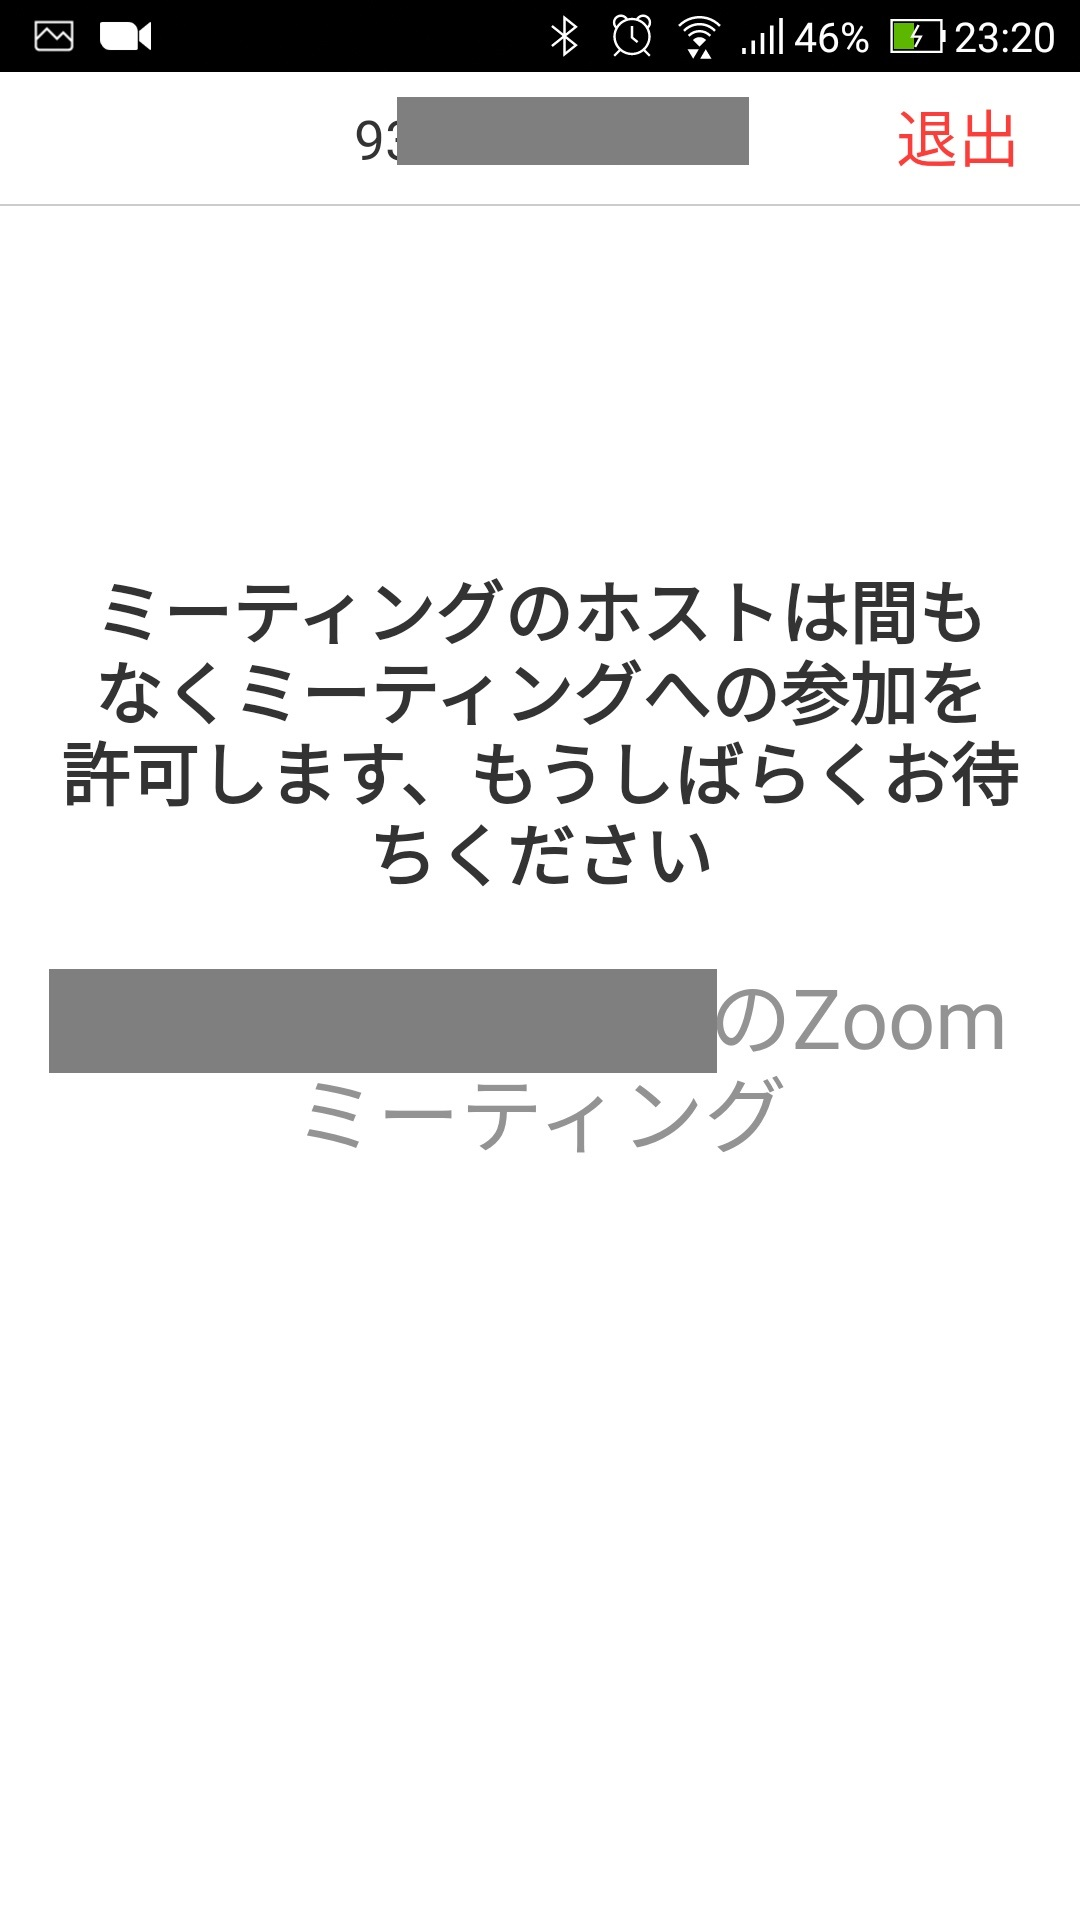 Screenshot 20200416 232022 - Zoomの使い方~一人で総合セルフチェック(パソコンとスマホを使って自分で)